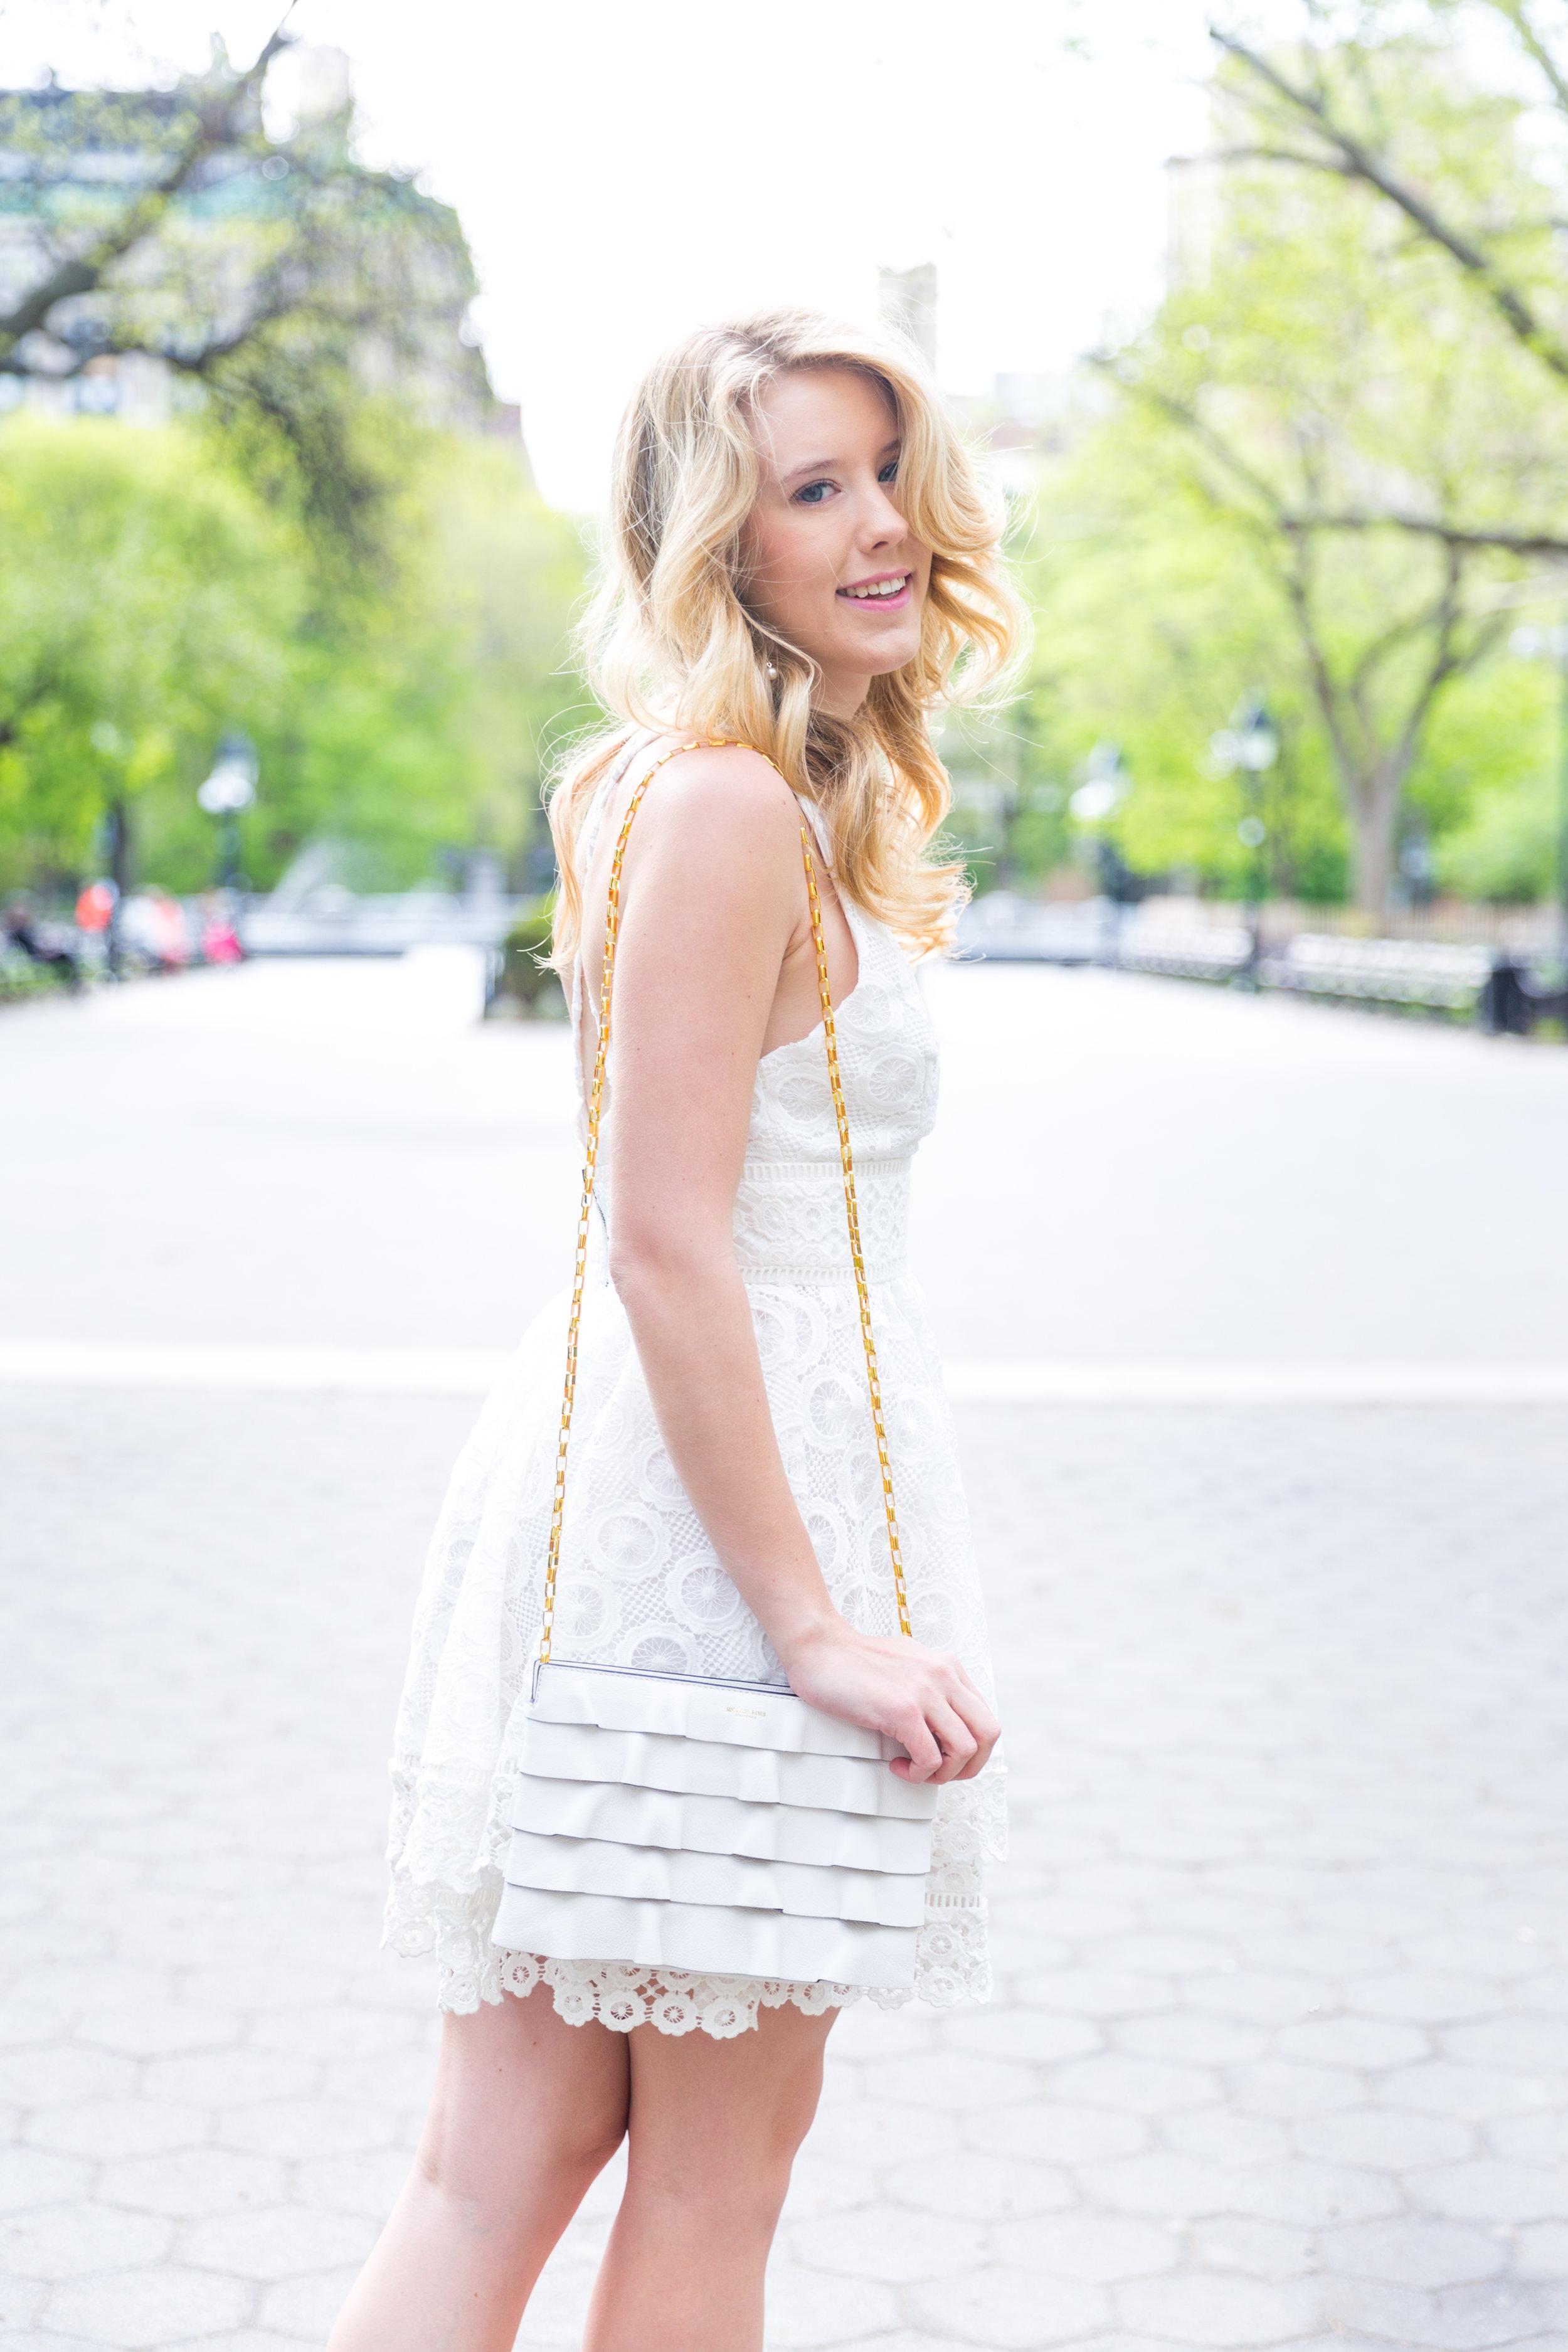 White Graduation Dress Spring NYC-3.jpg